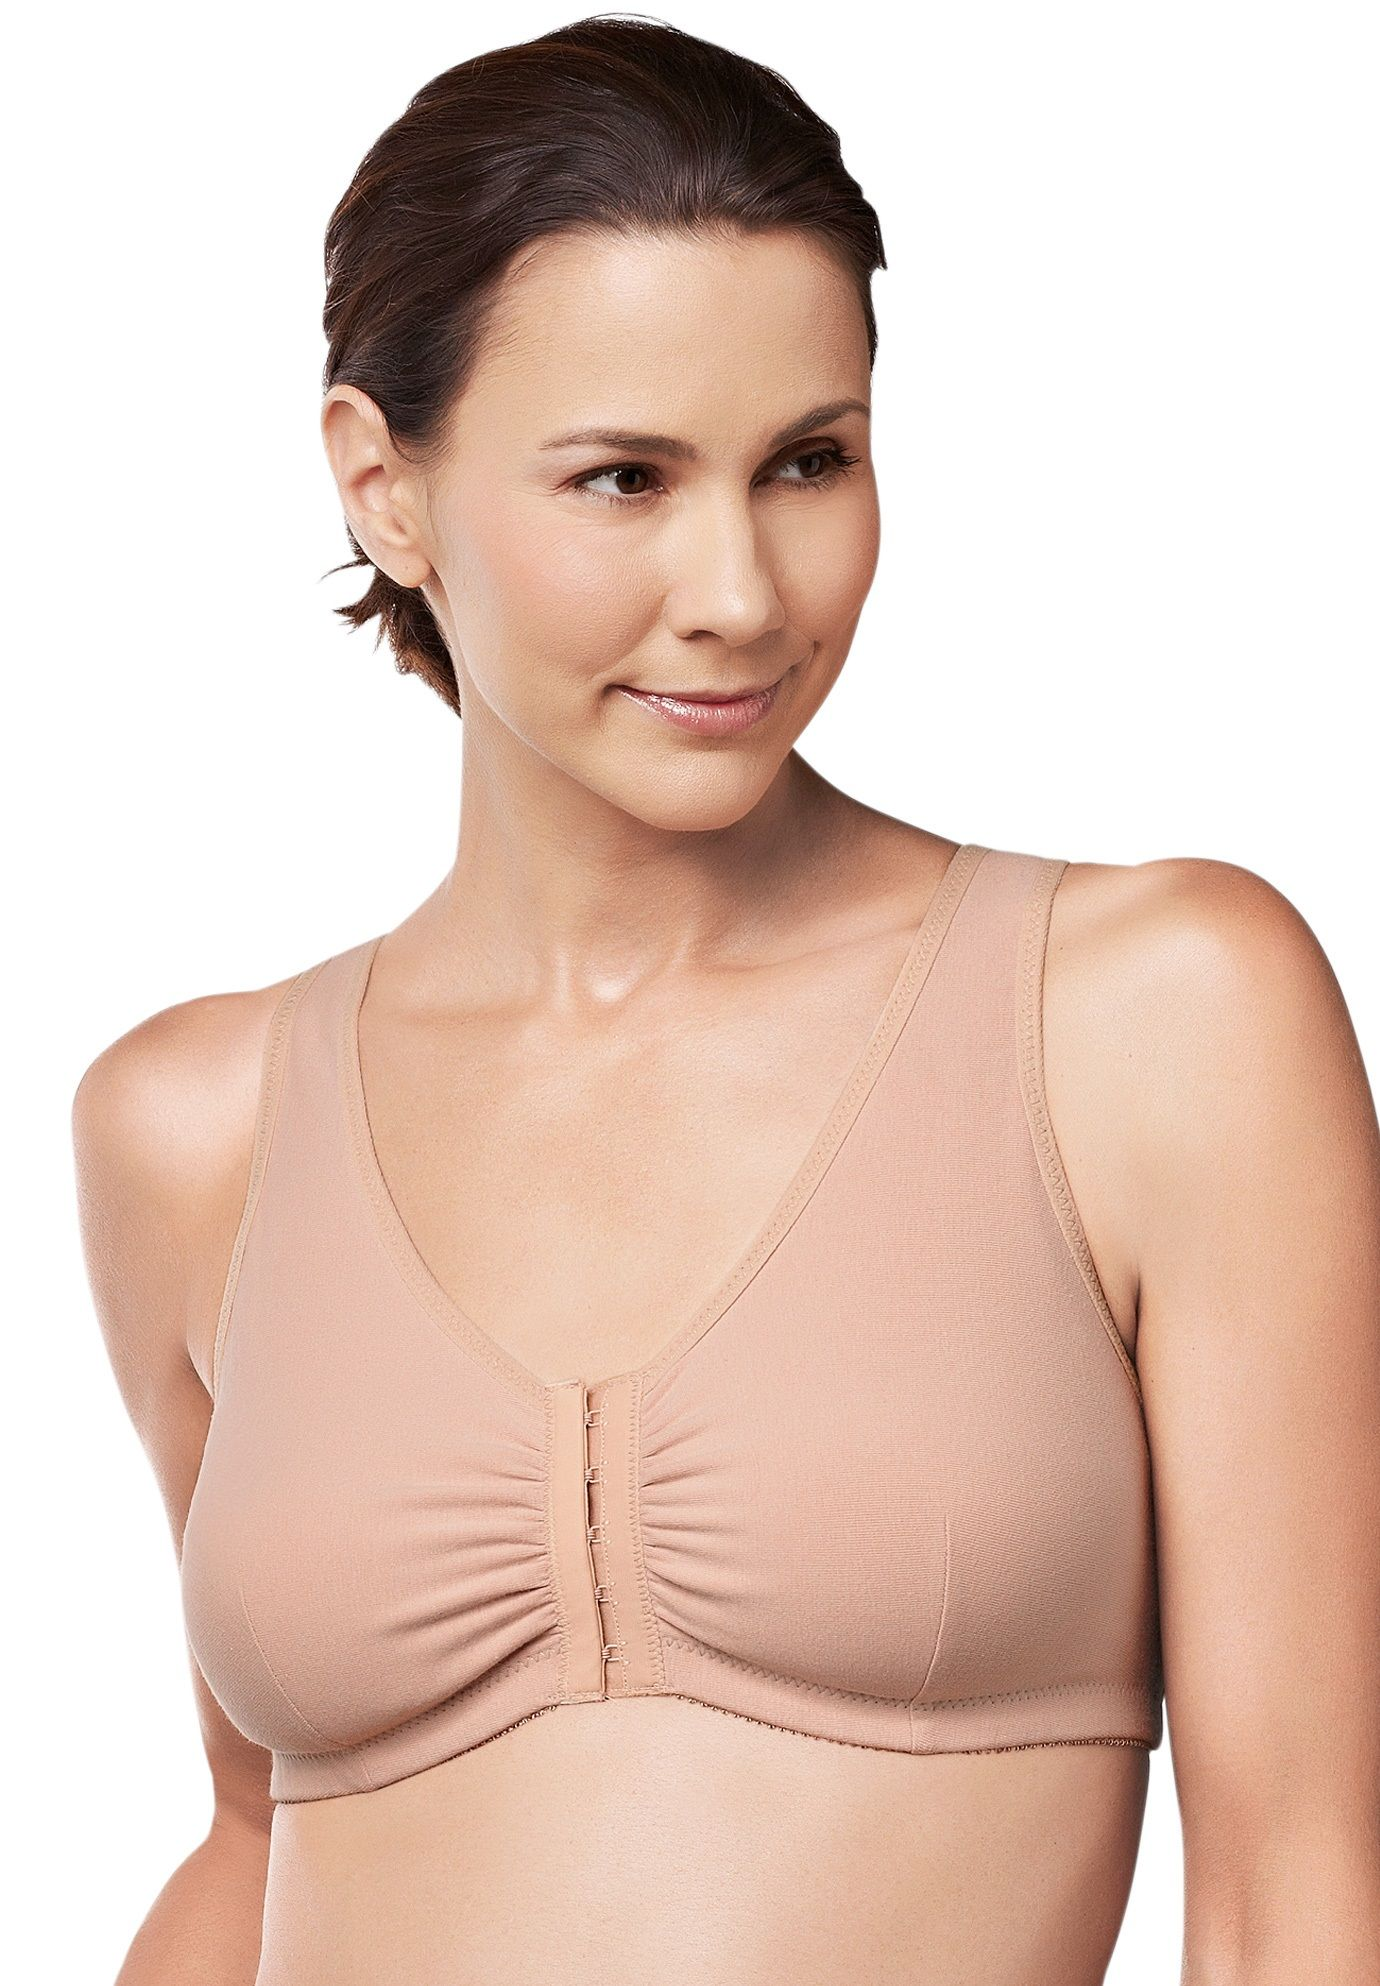 c940afd109cbf Amoena Frances Post Surgical Bra - Women s Plus Size Clothing ...